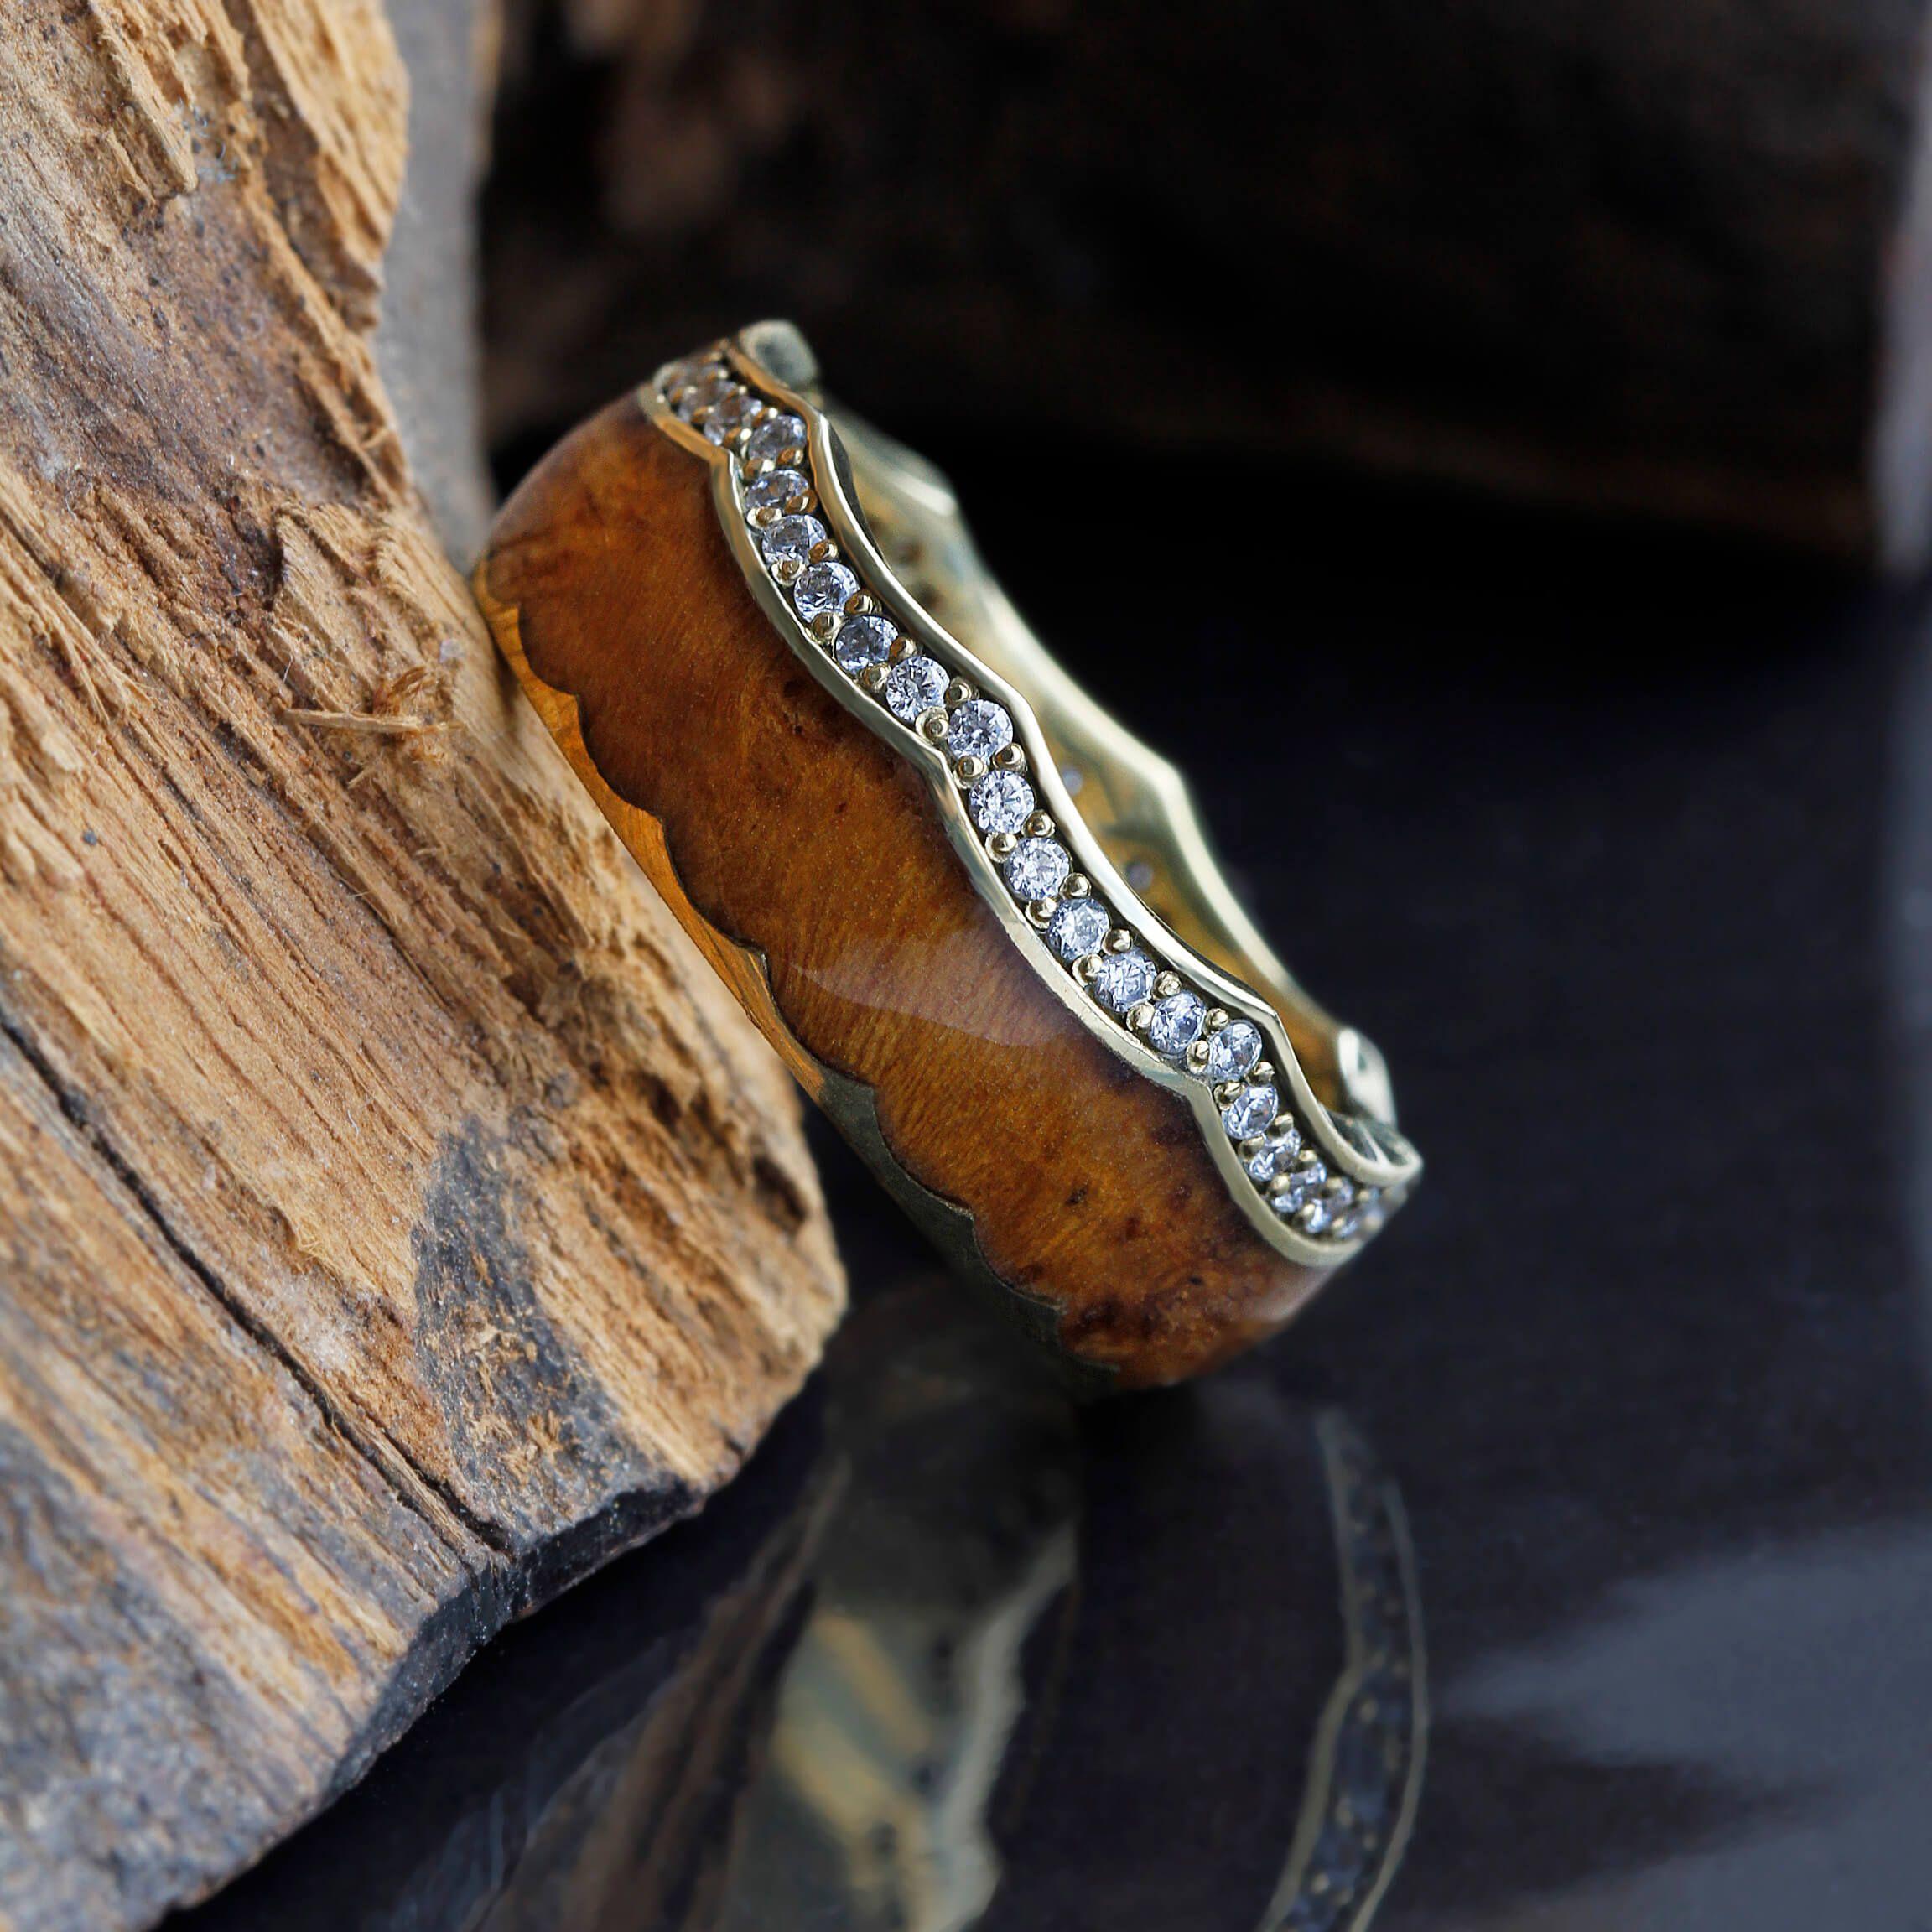 Diamond Eternity Wedding Band, Teak Wood Crown Ring With